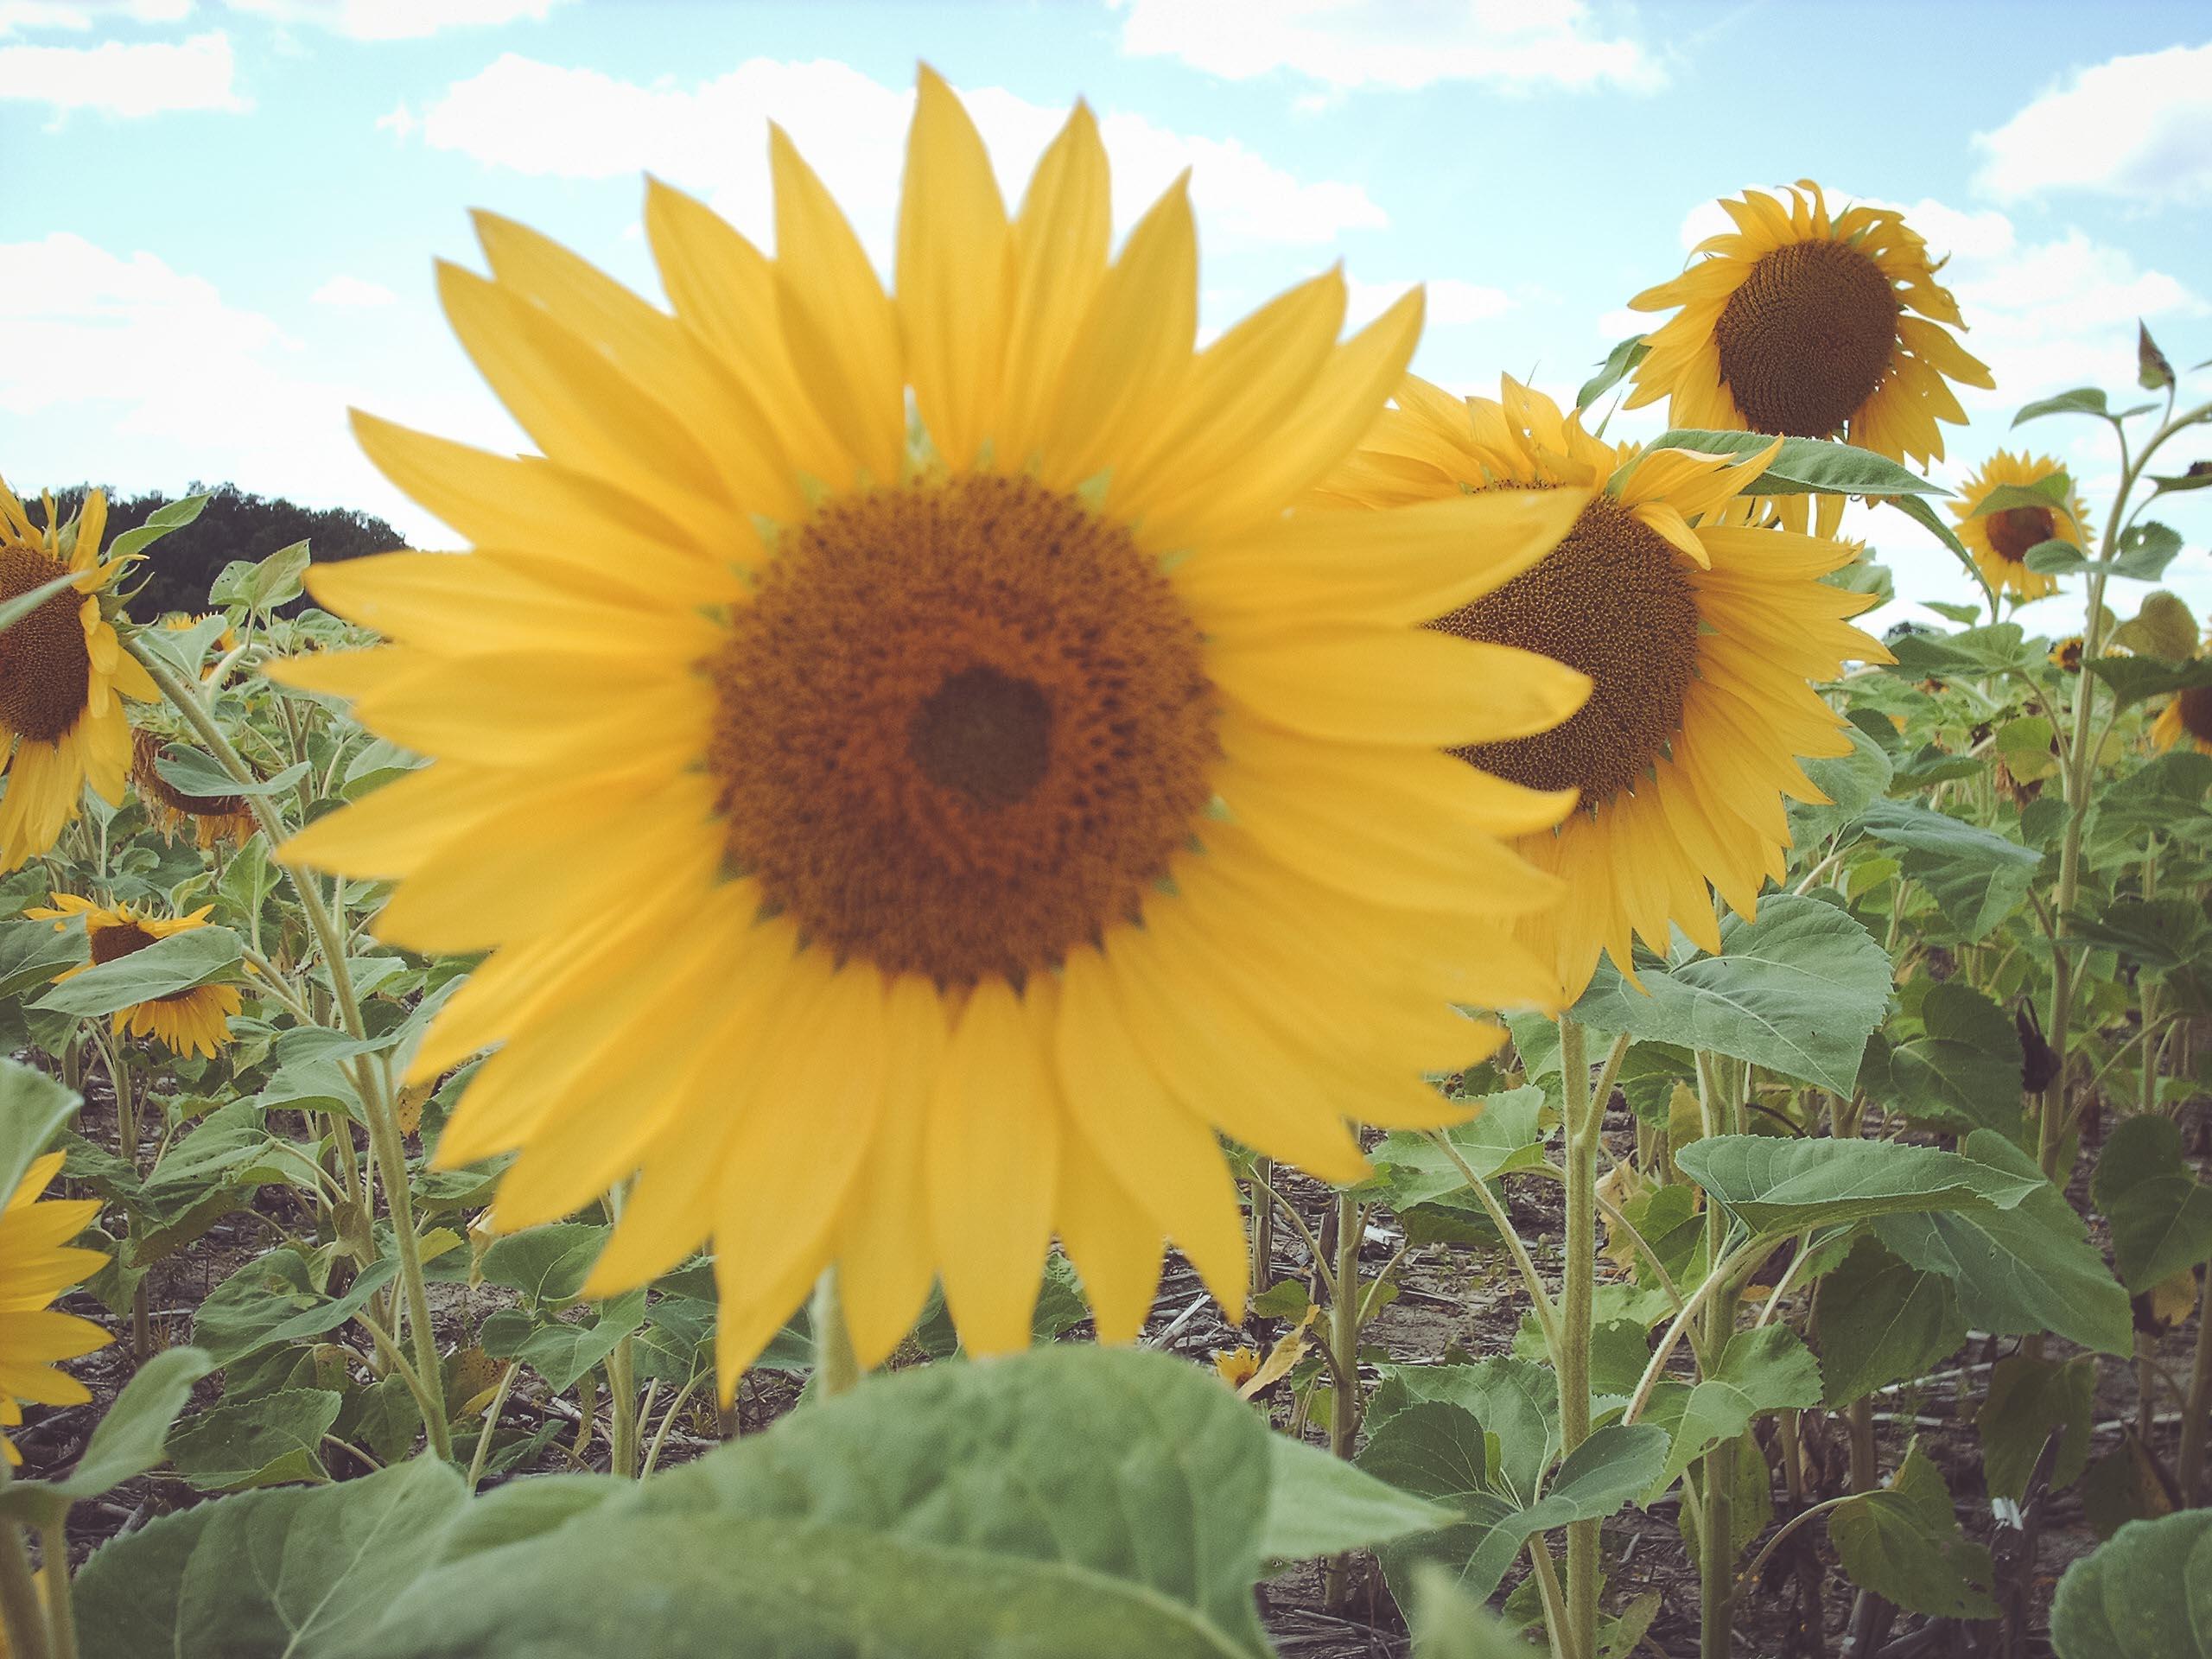 Sunflower Patch in Michigan